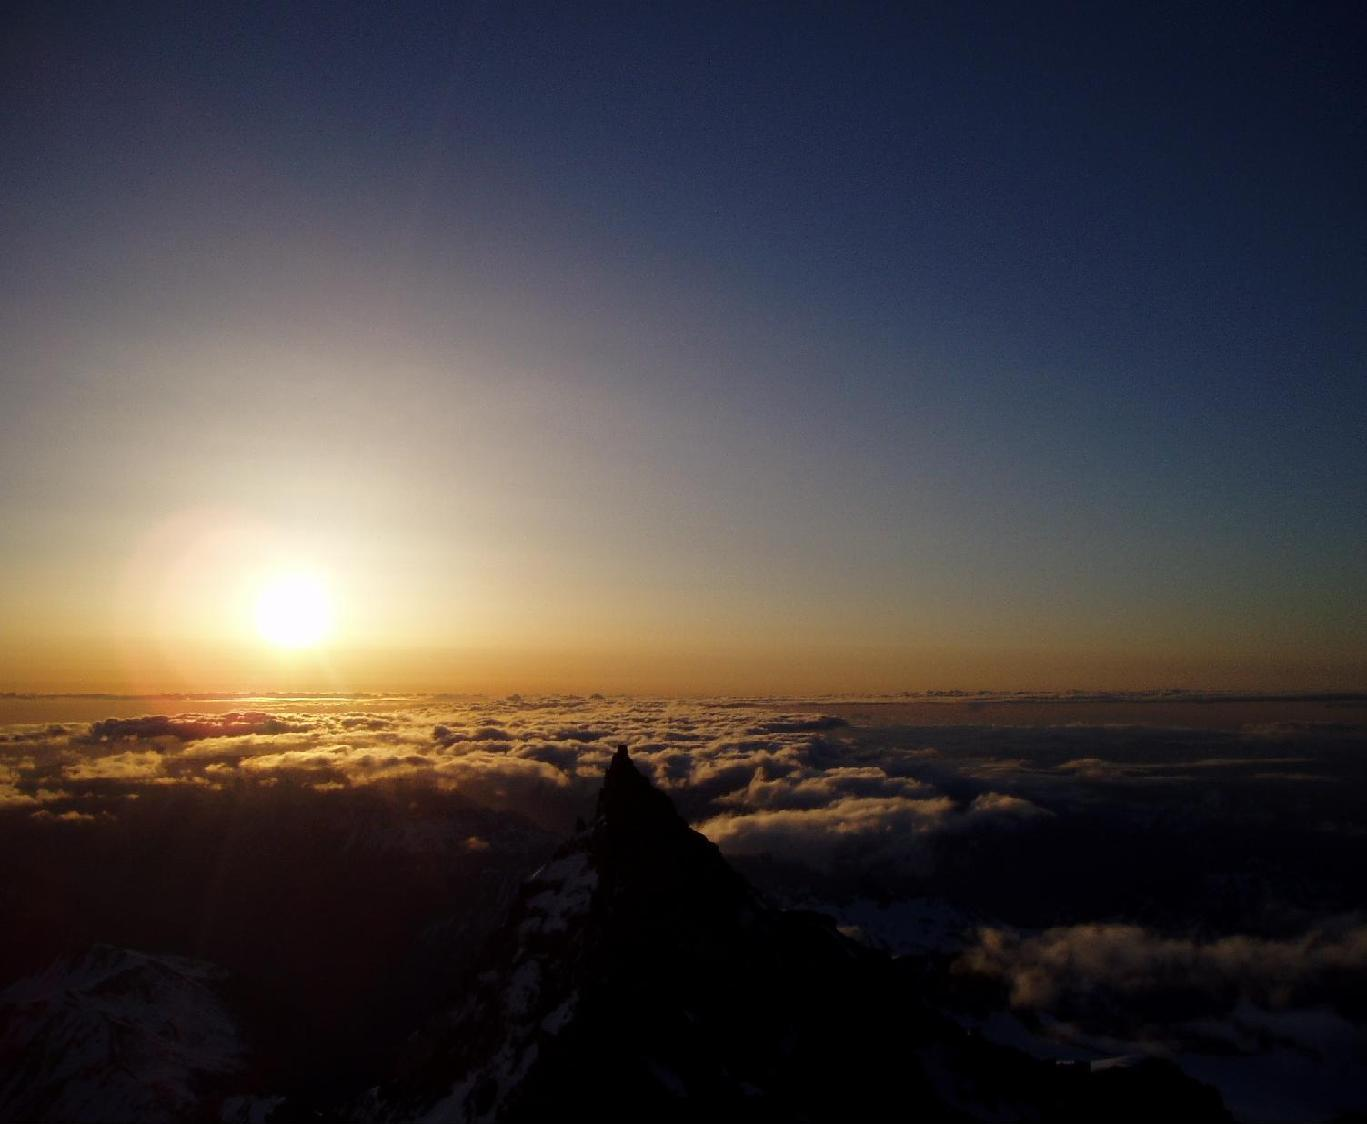 Taken at sunrise from 11,500 feet on the Ingraham Glacier